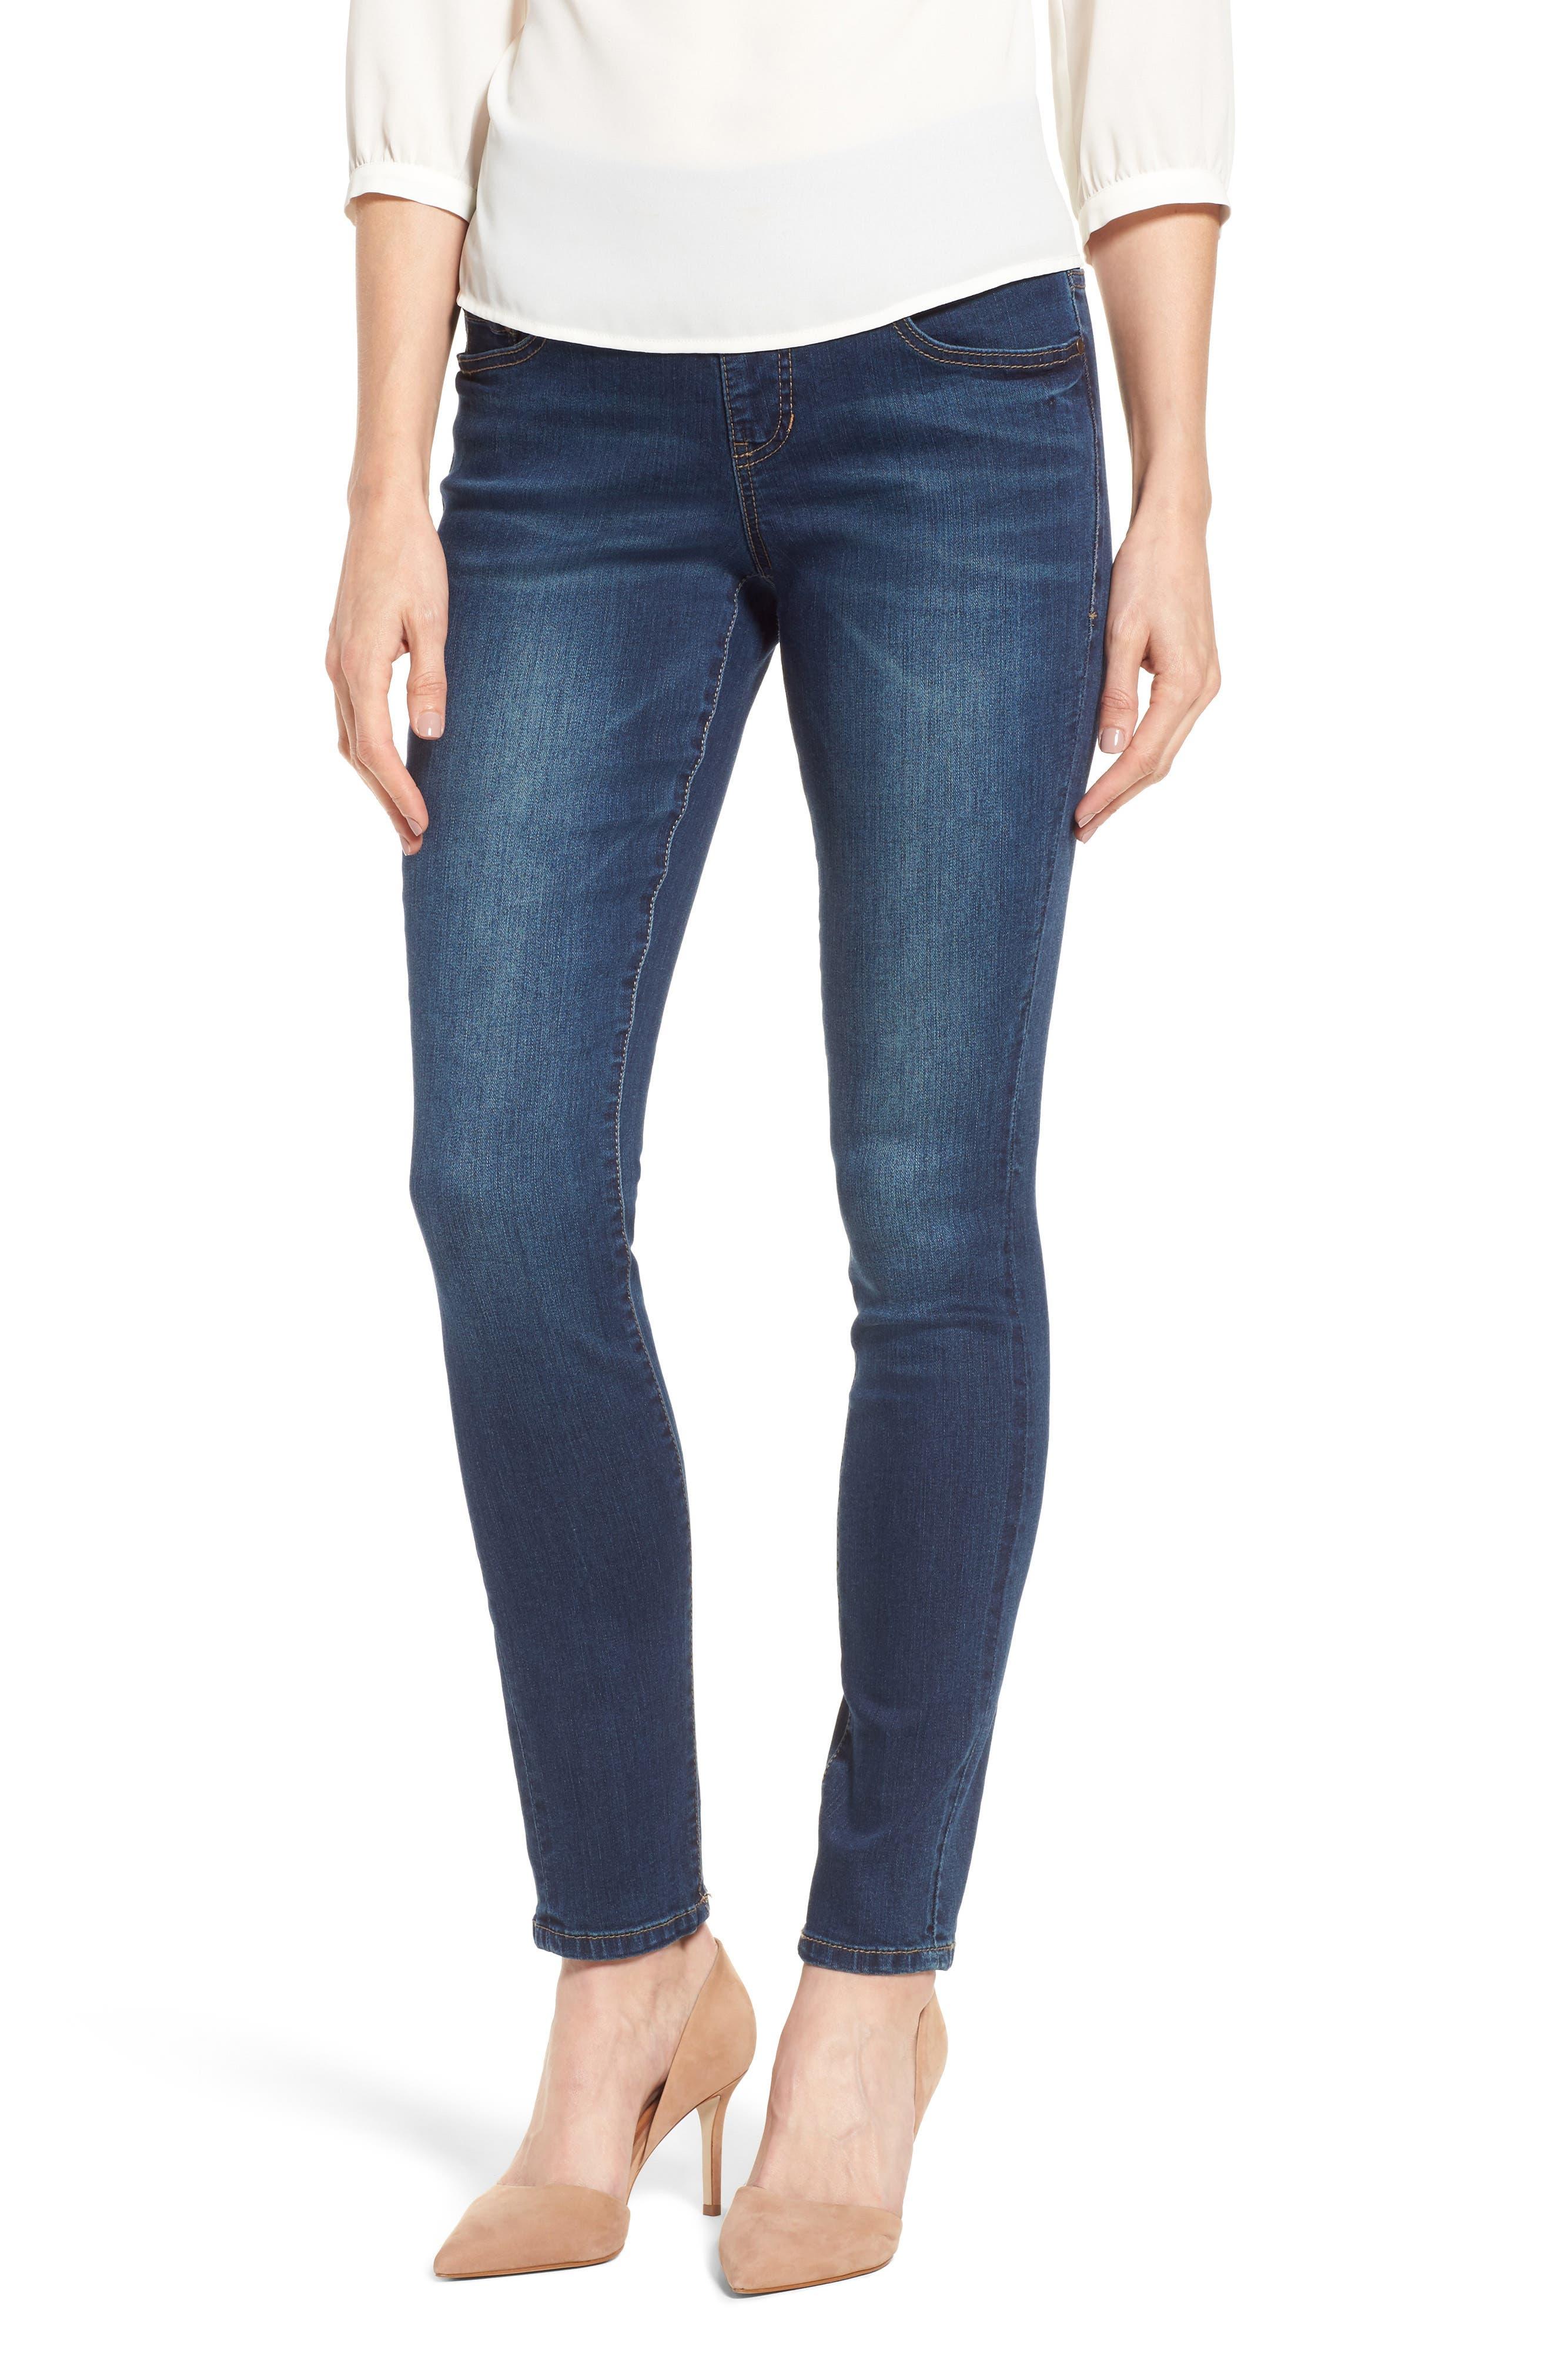 Main Image - Jag Jeans Nora Stretch Skinny Jeans (Regular & Petite)